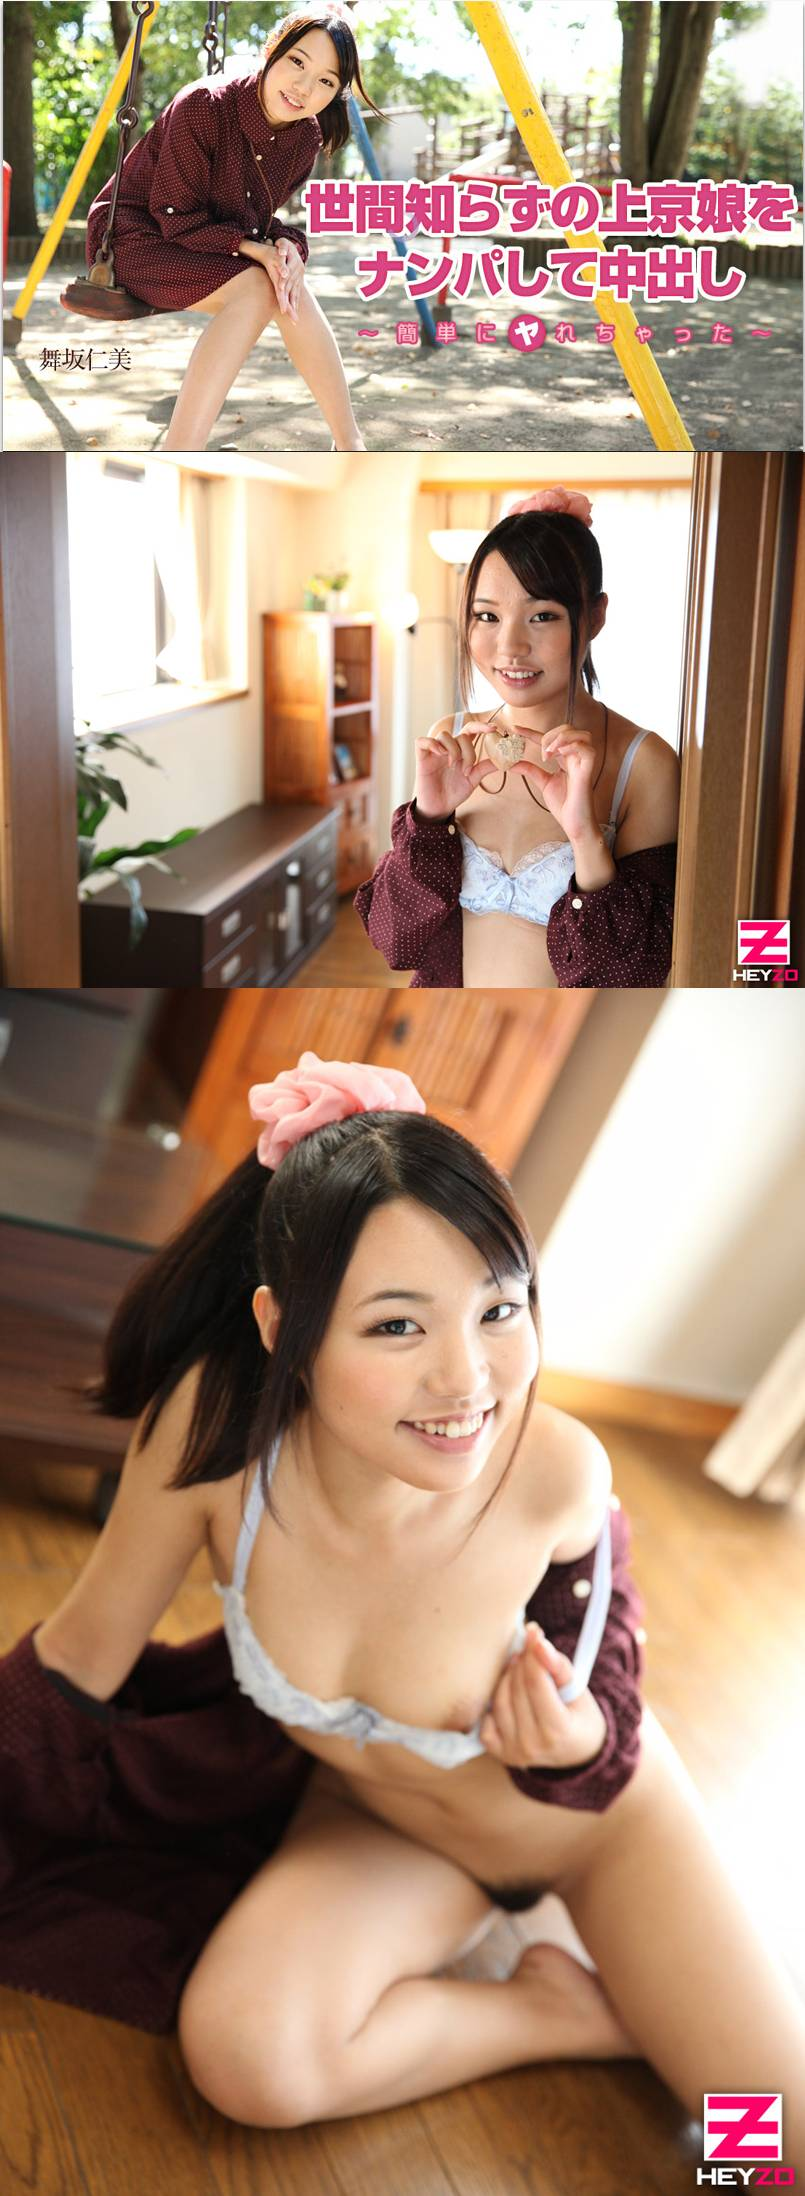 【MEGA】HEYZO0937-中出思想簡單上京娘舞板仁美